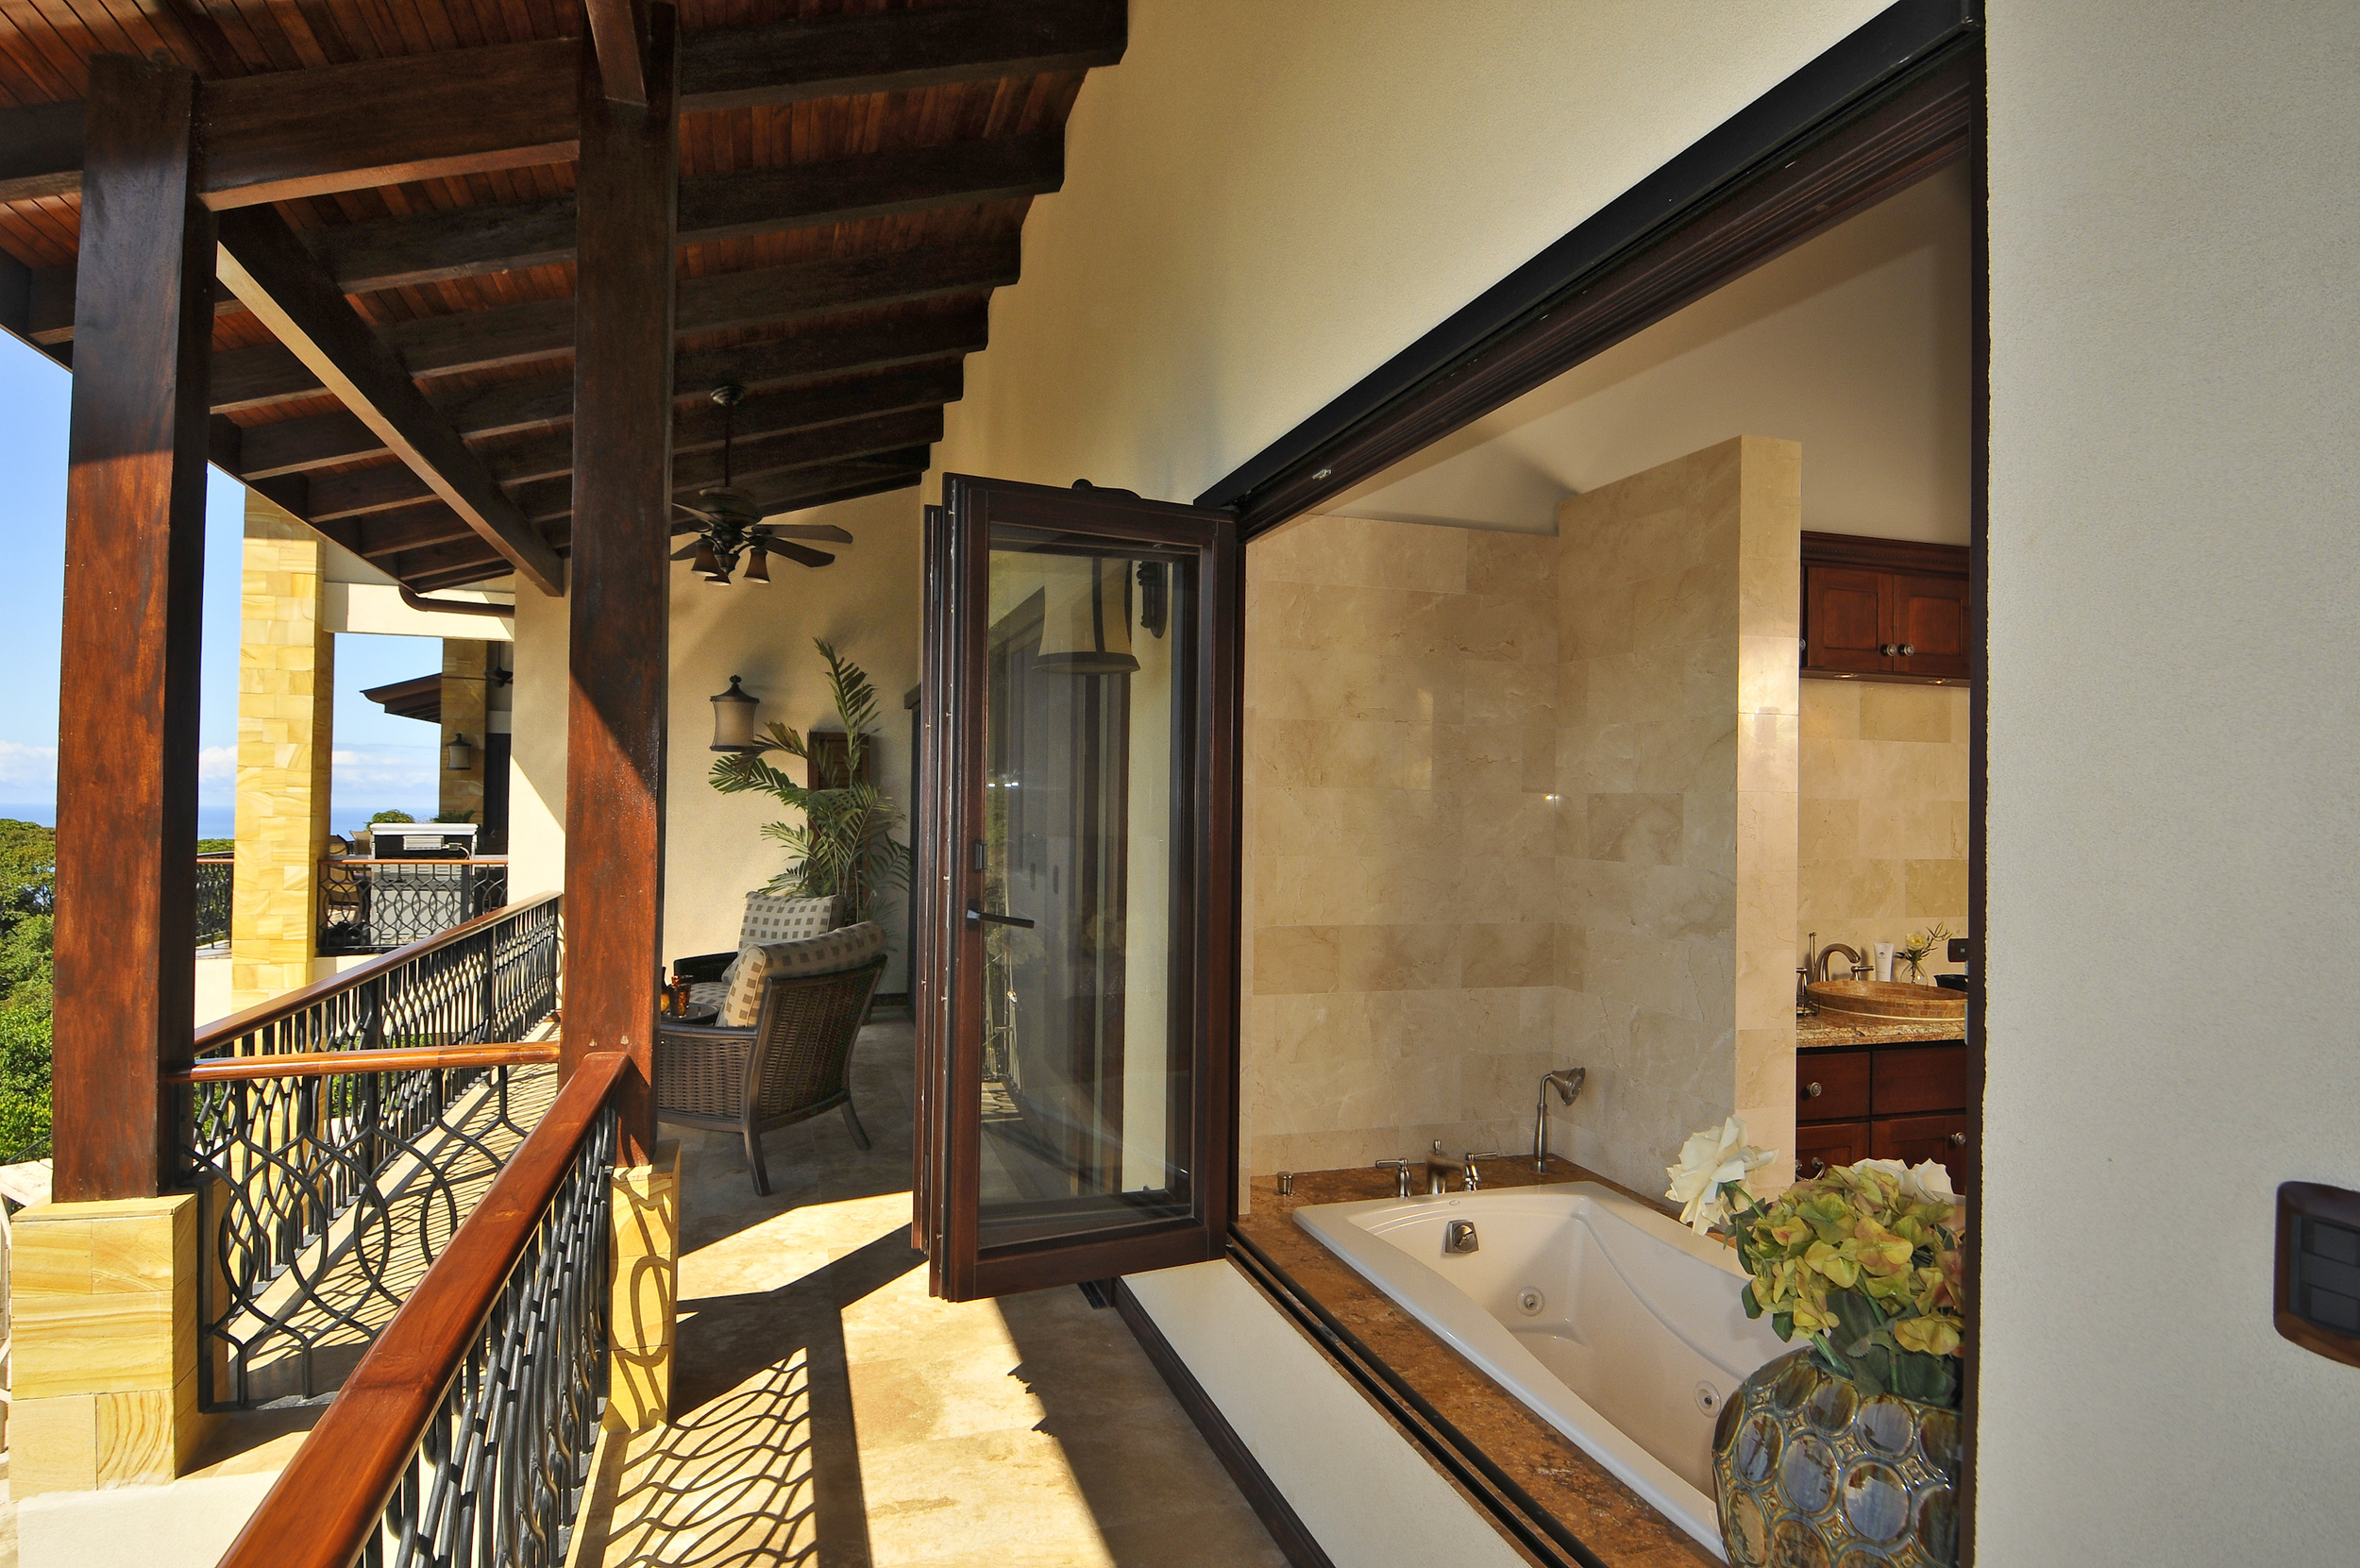 flex5-yoga-retreat-costa-rica-villa-king-suite-bedroom-balcony.jpg